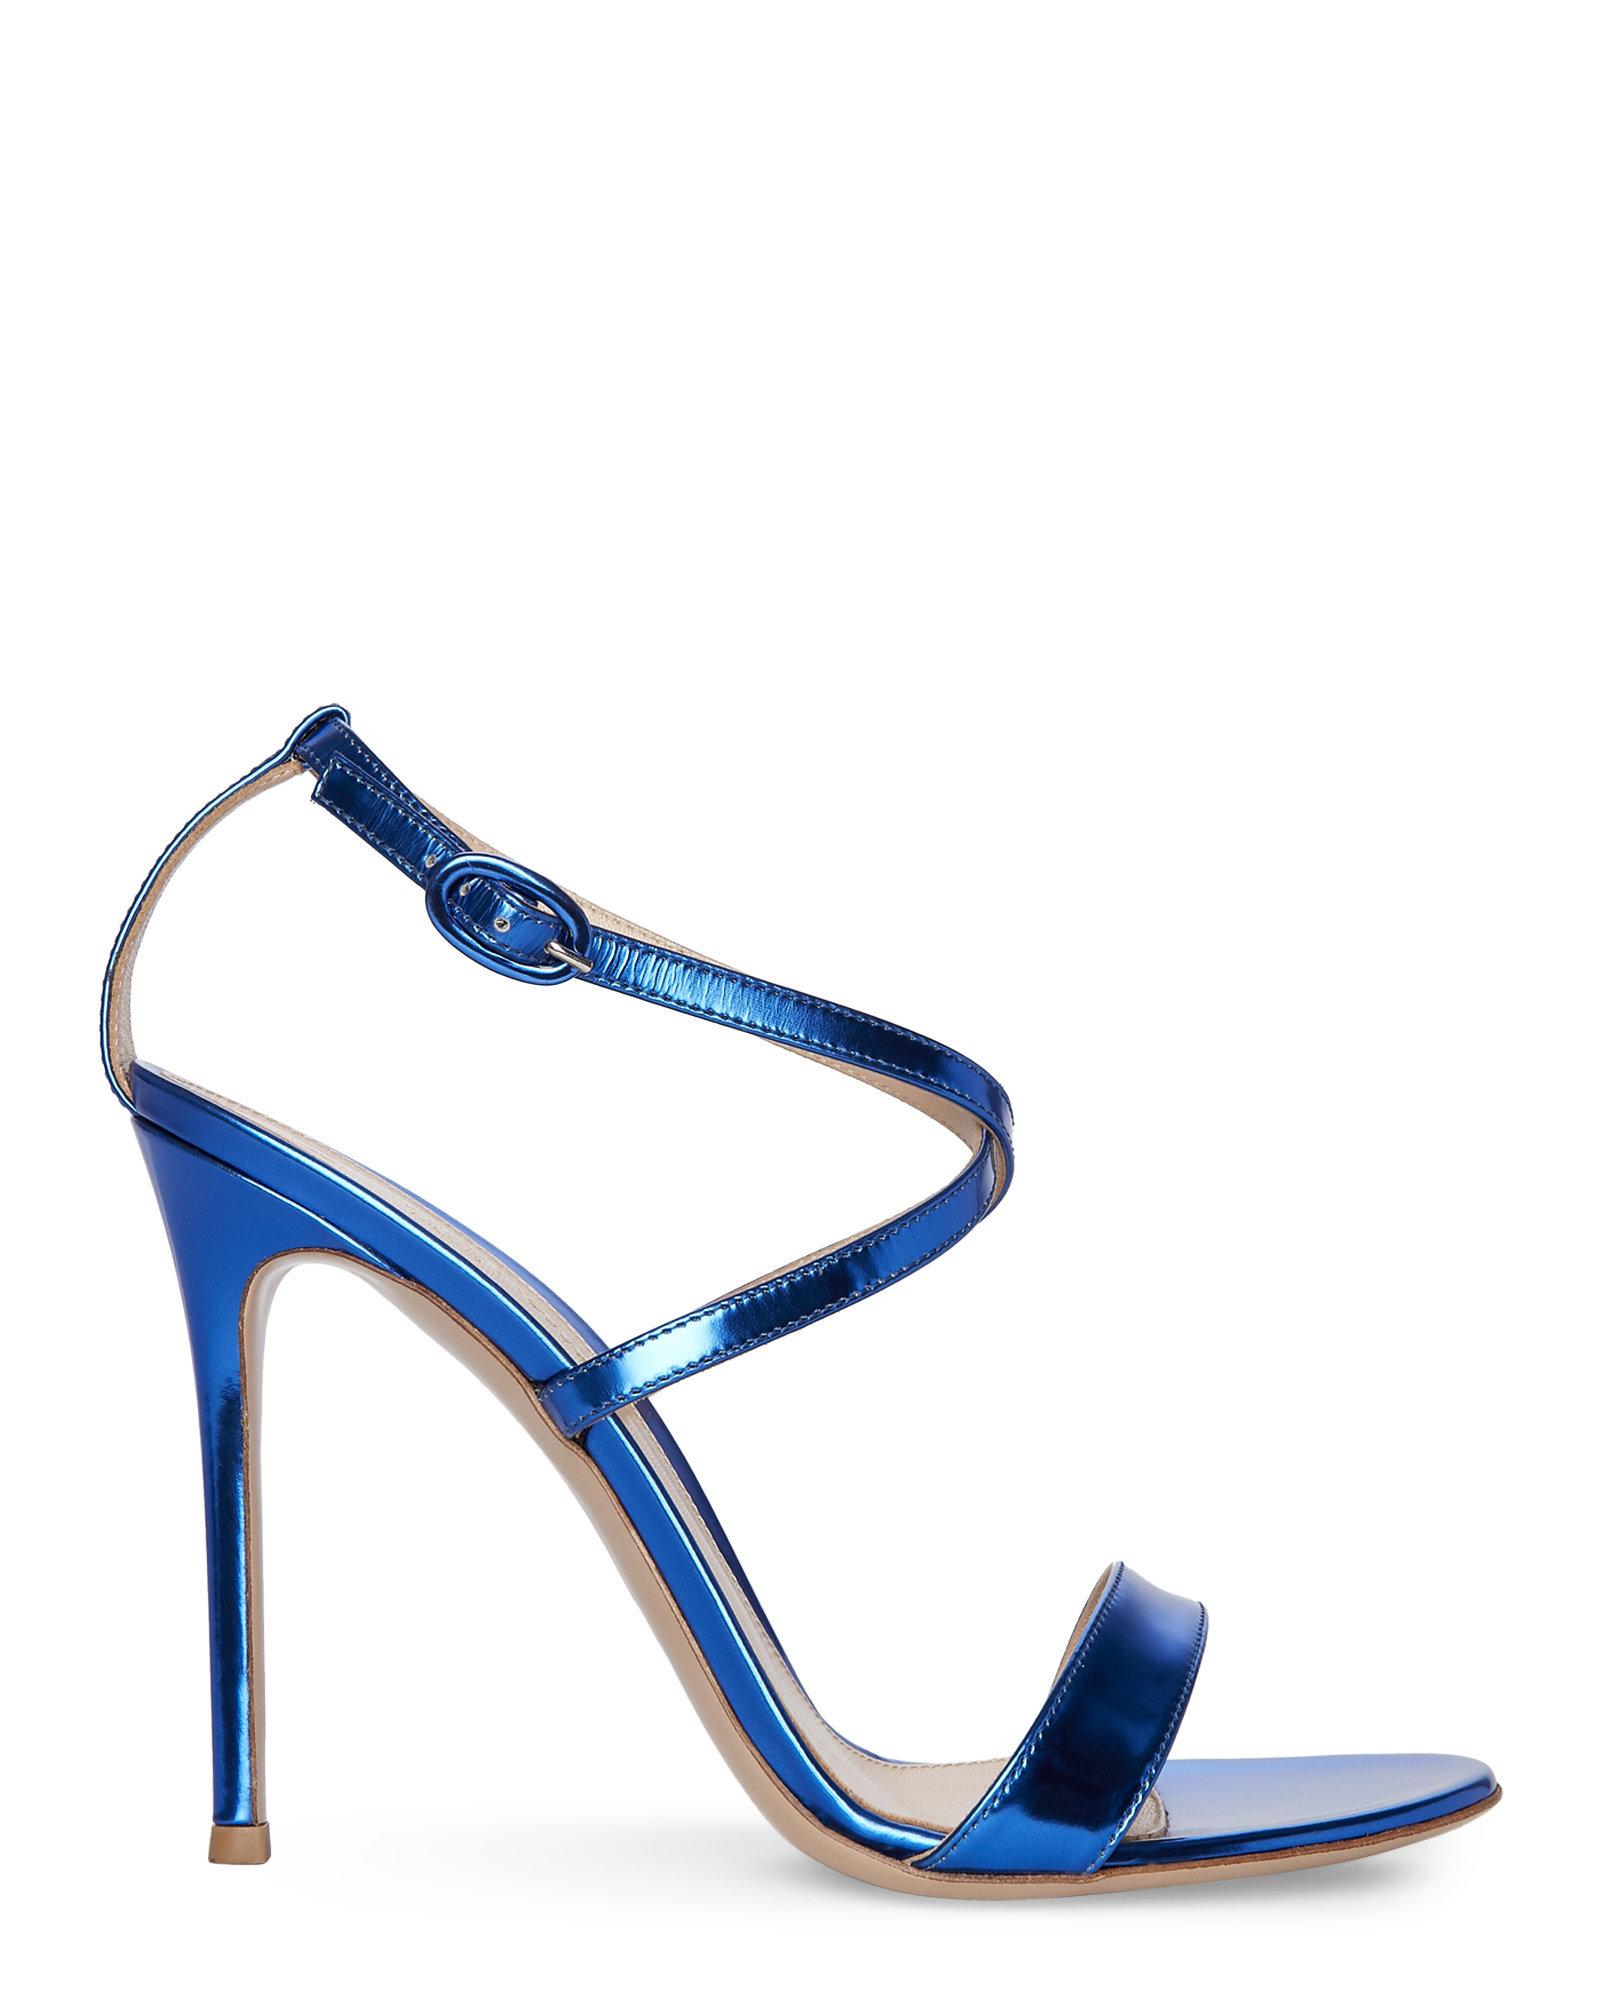 84464c68a34 Lyst - Gianvito Rossi Metallic Cobalt Strappy Sandals in Blue